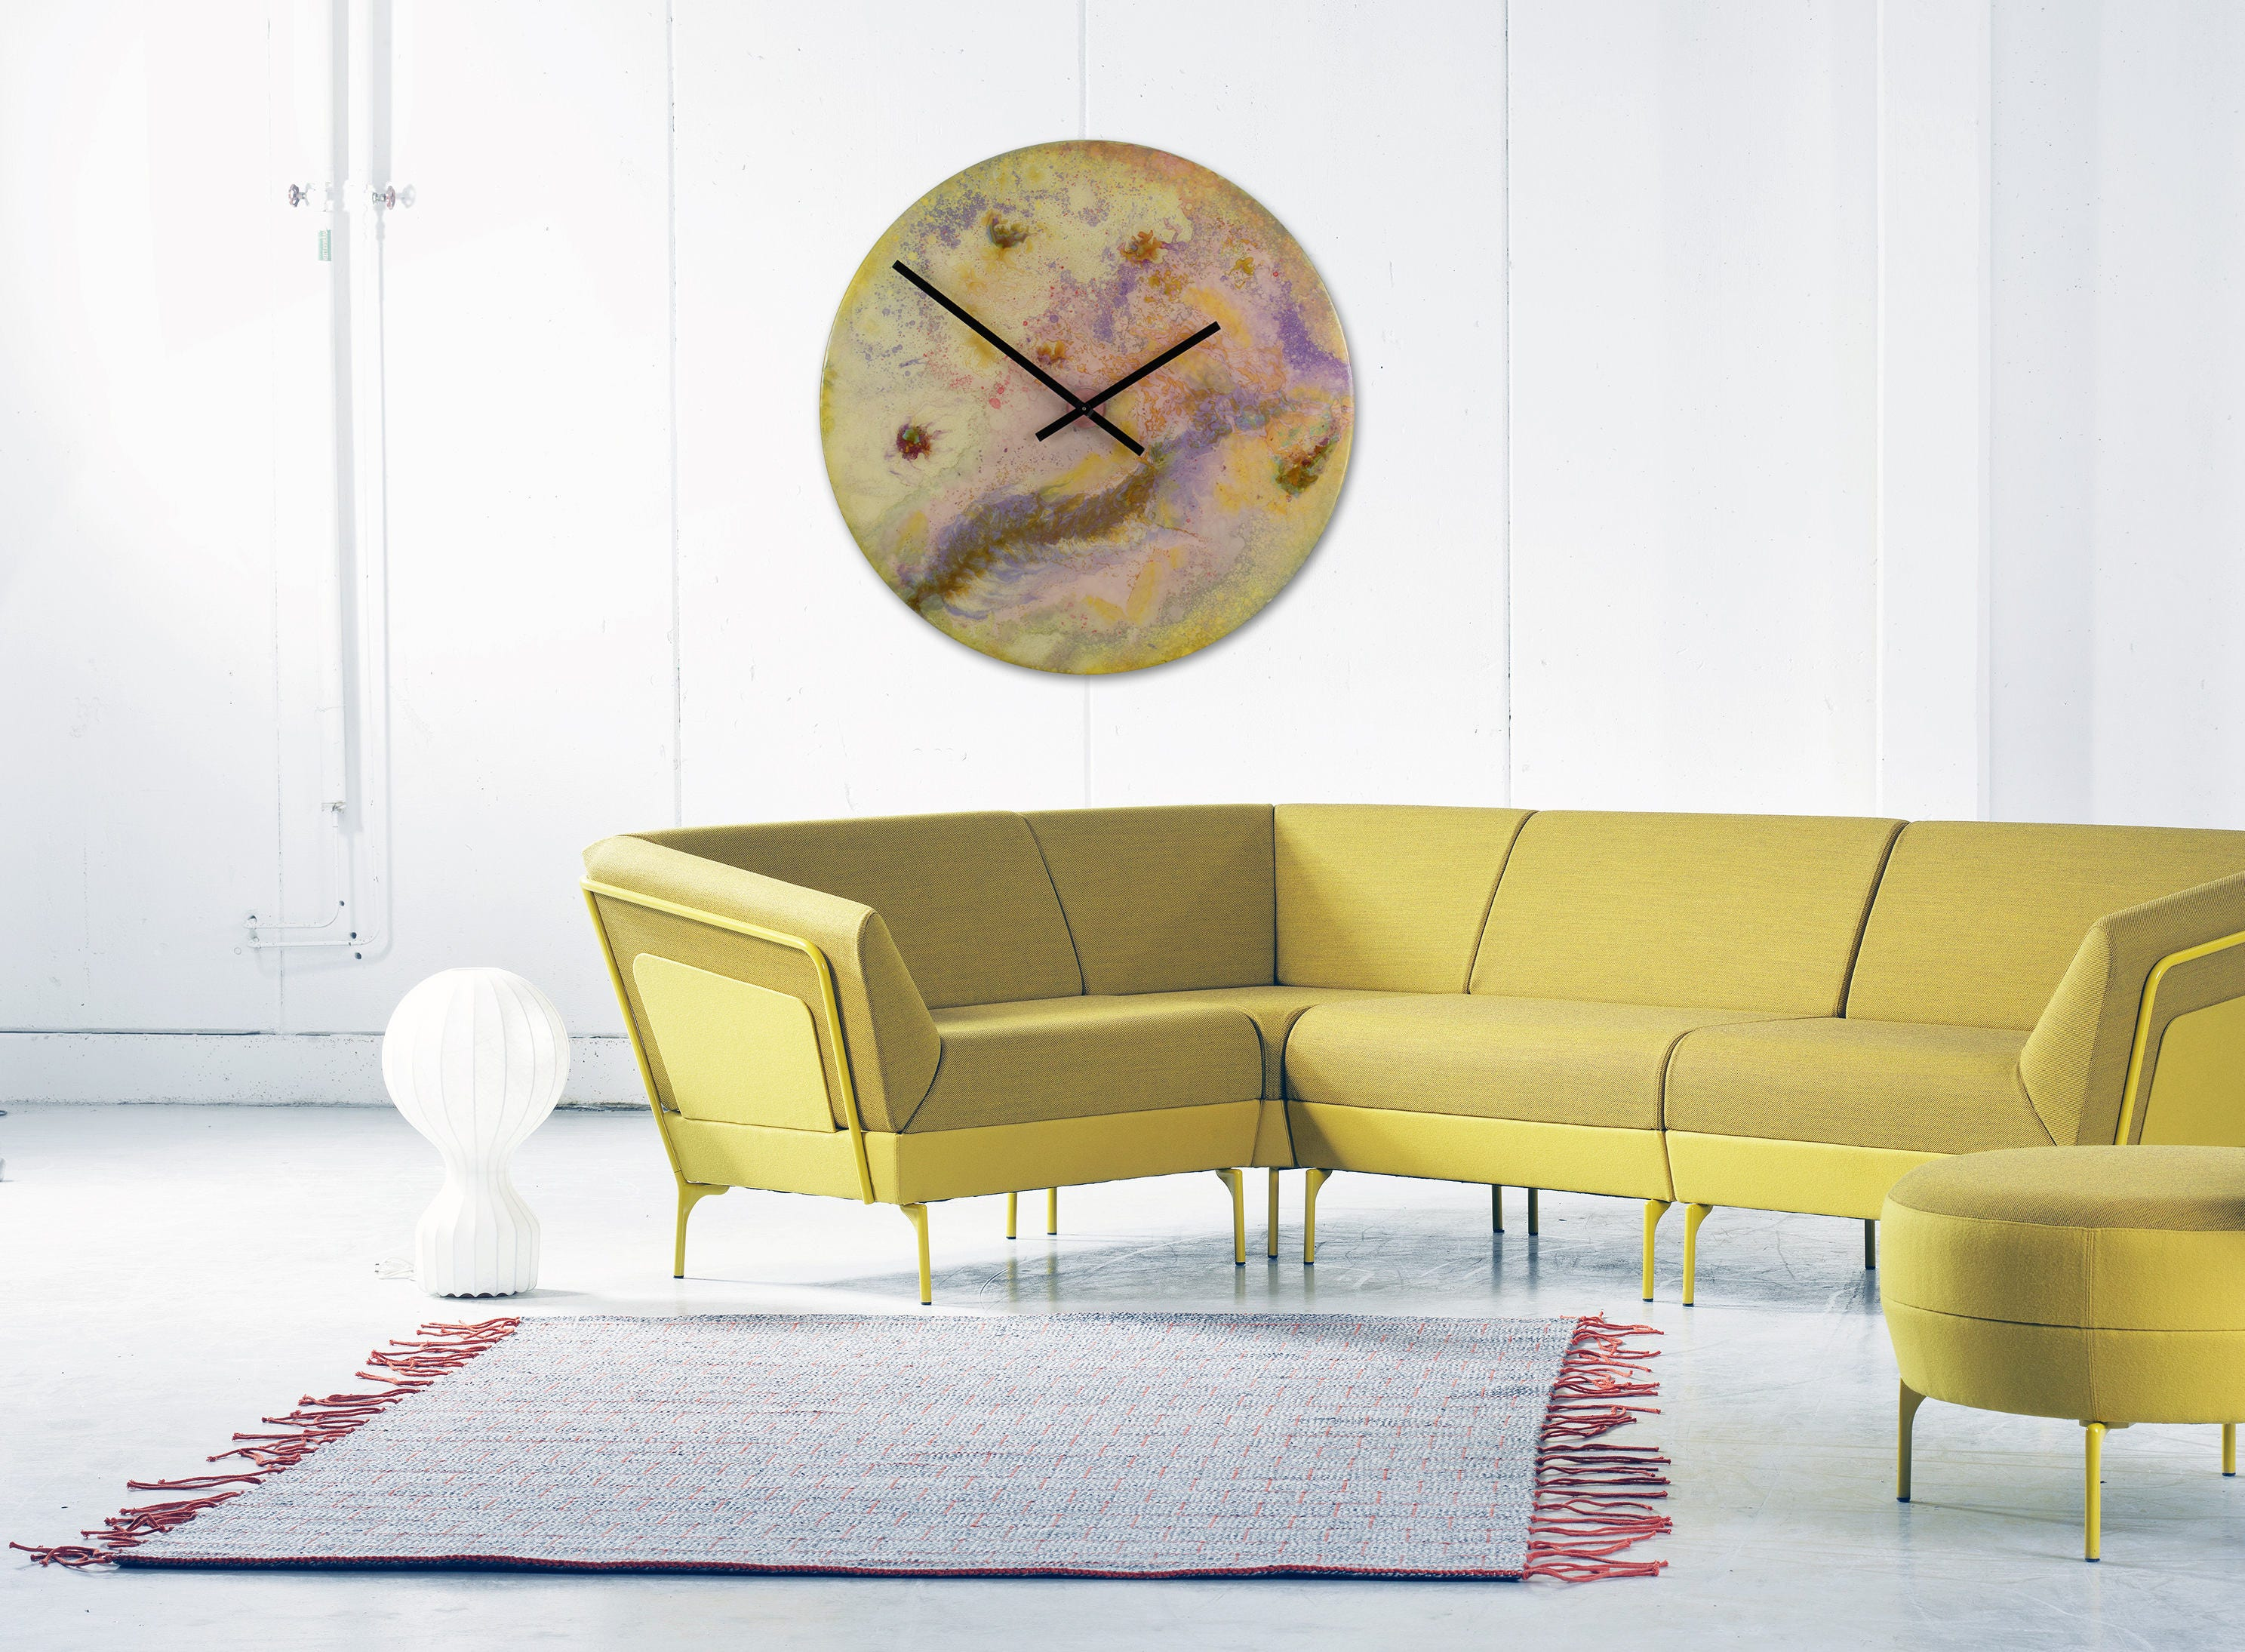 Large Circular Art Astronomy Art Large Clock Art With Lights   Etsy